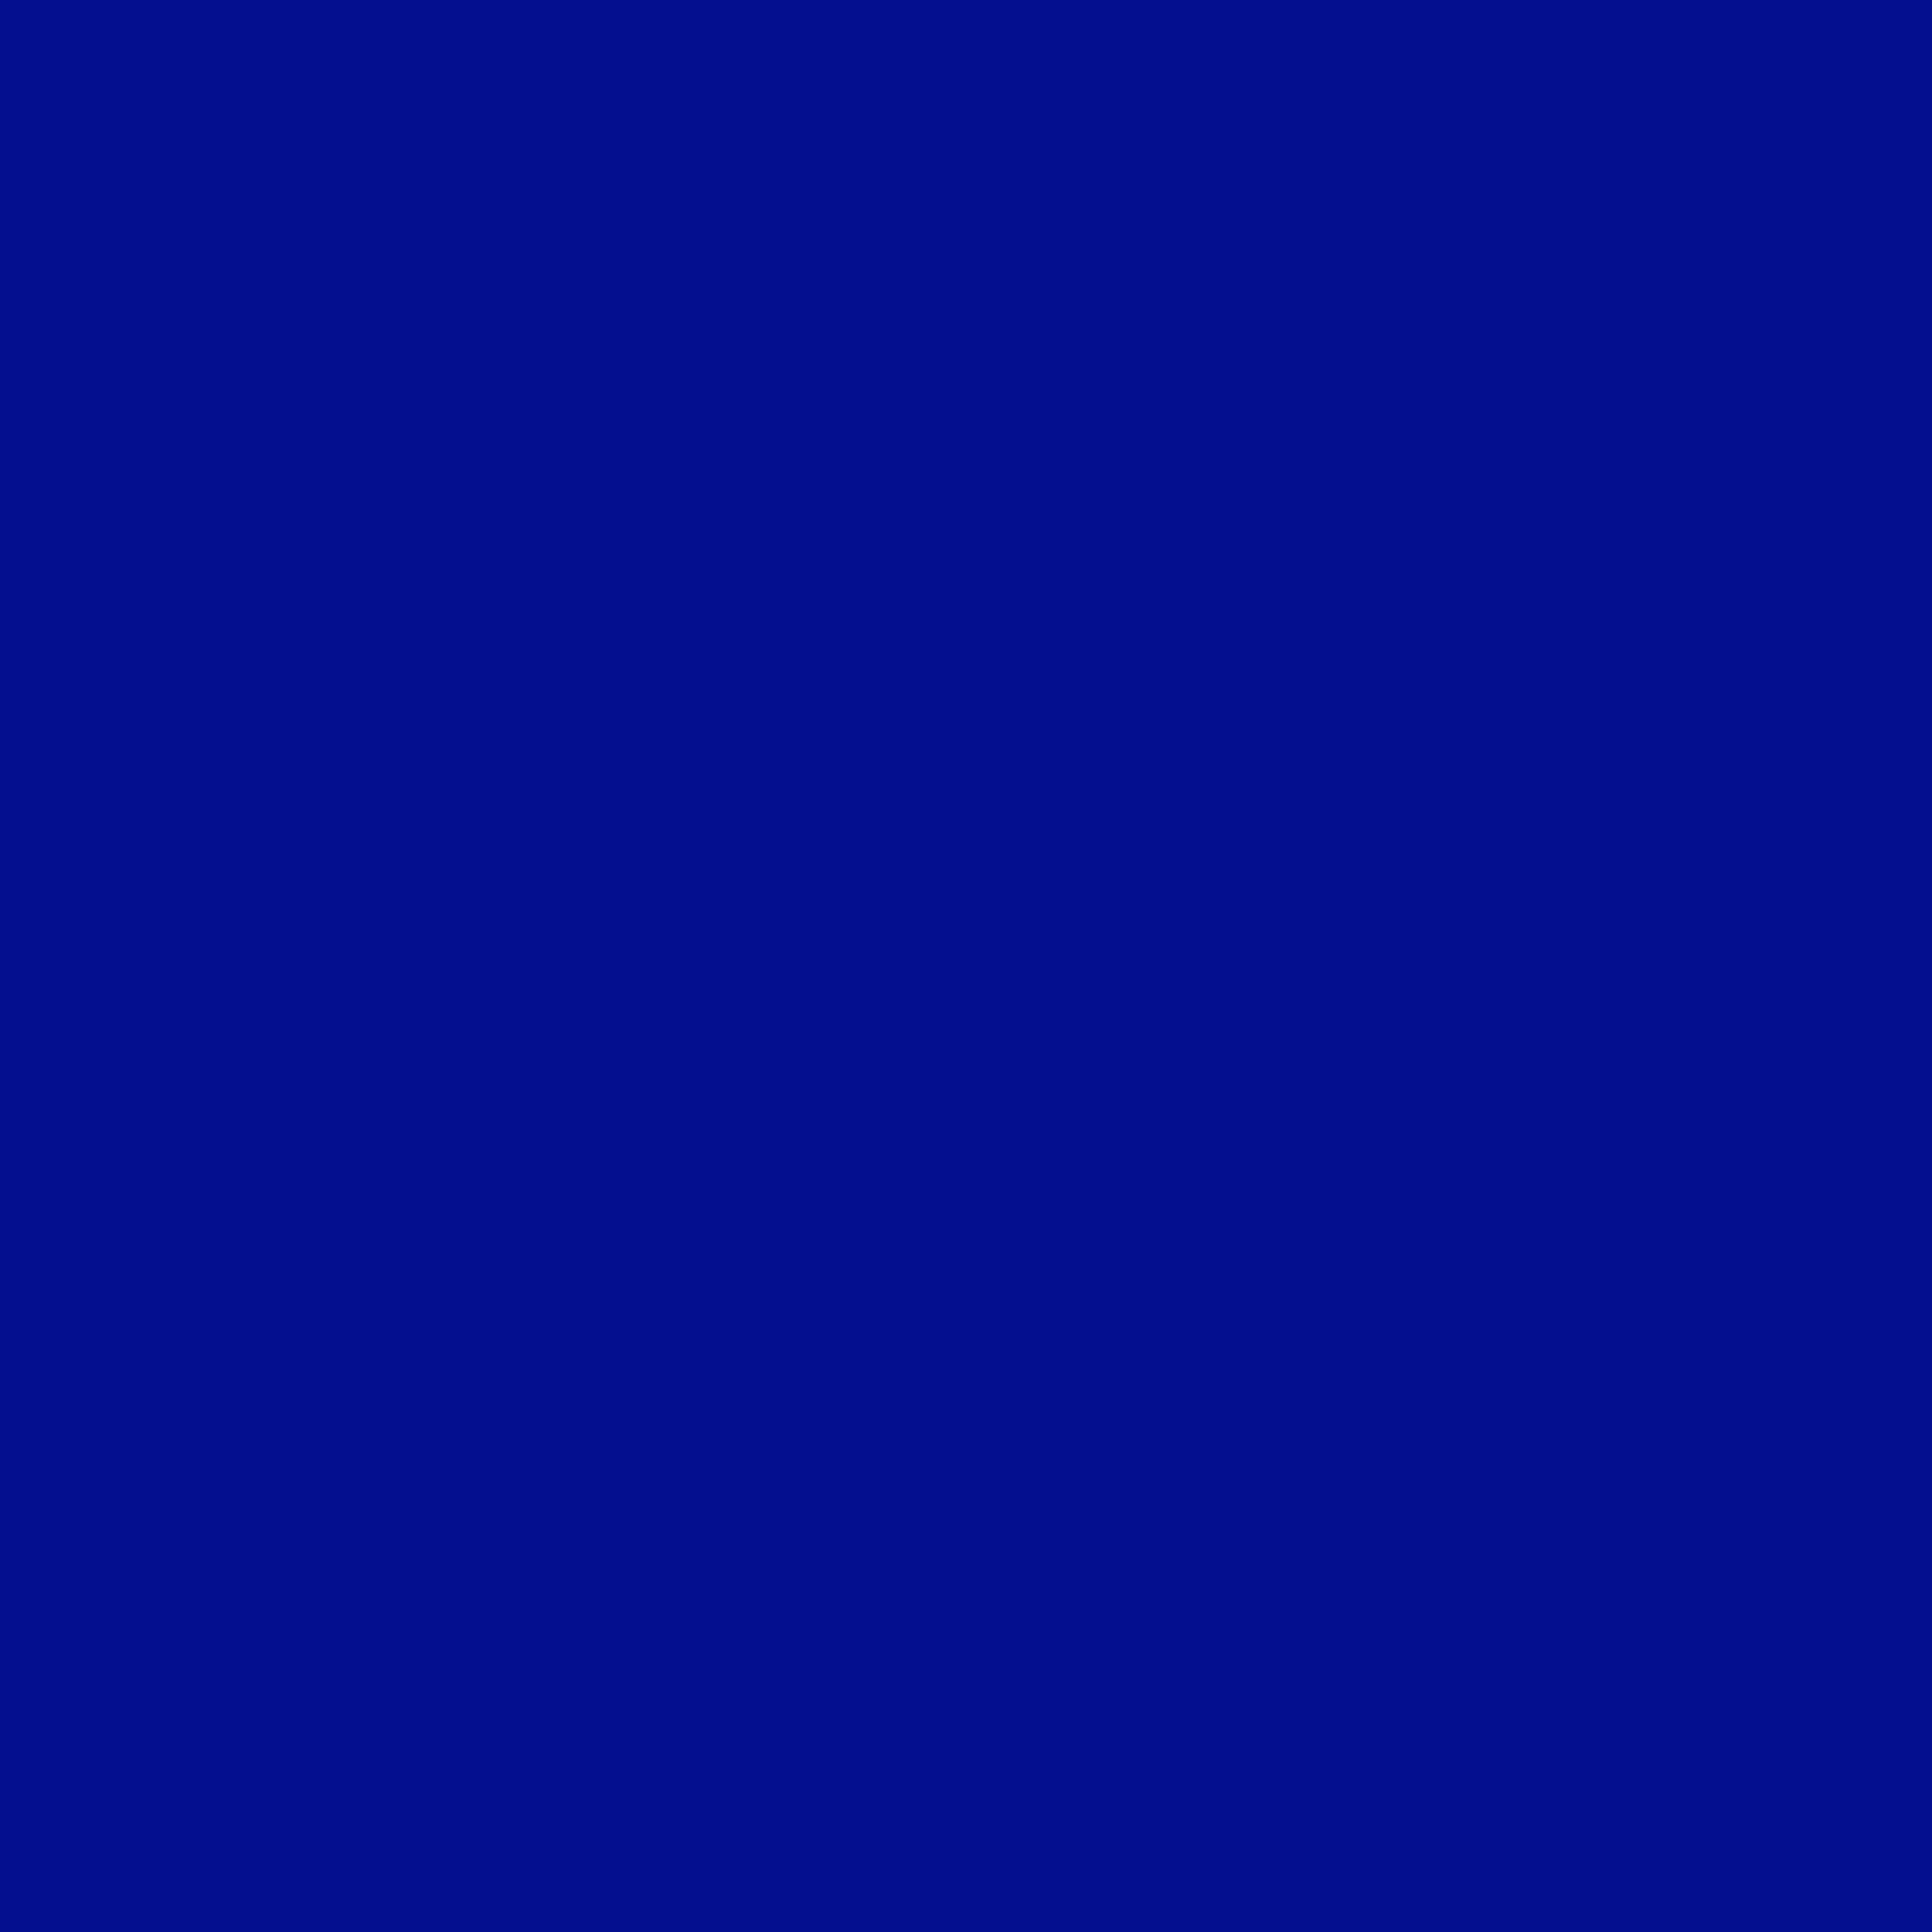 Blue Gradient iPad Air Wallpapers HD